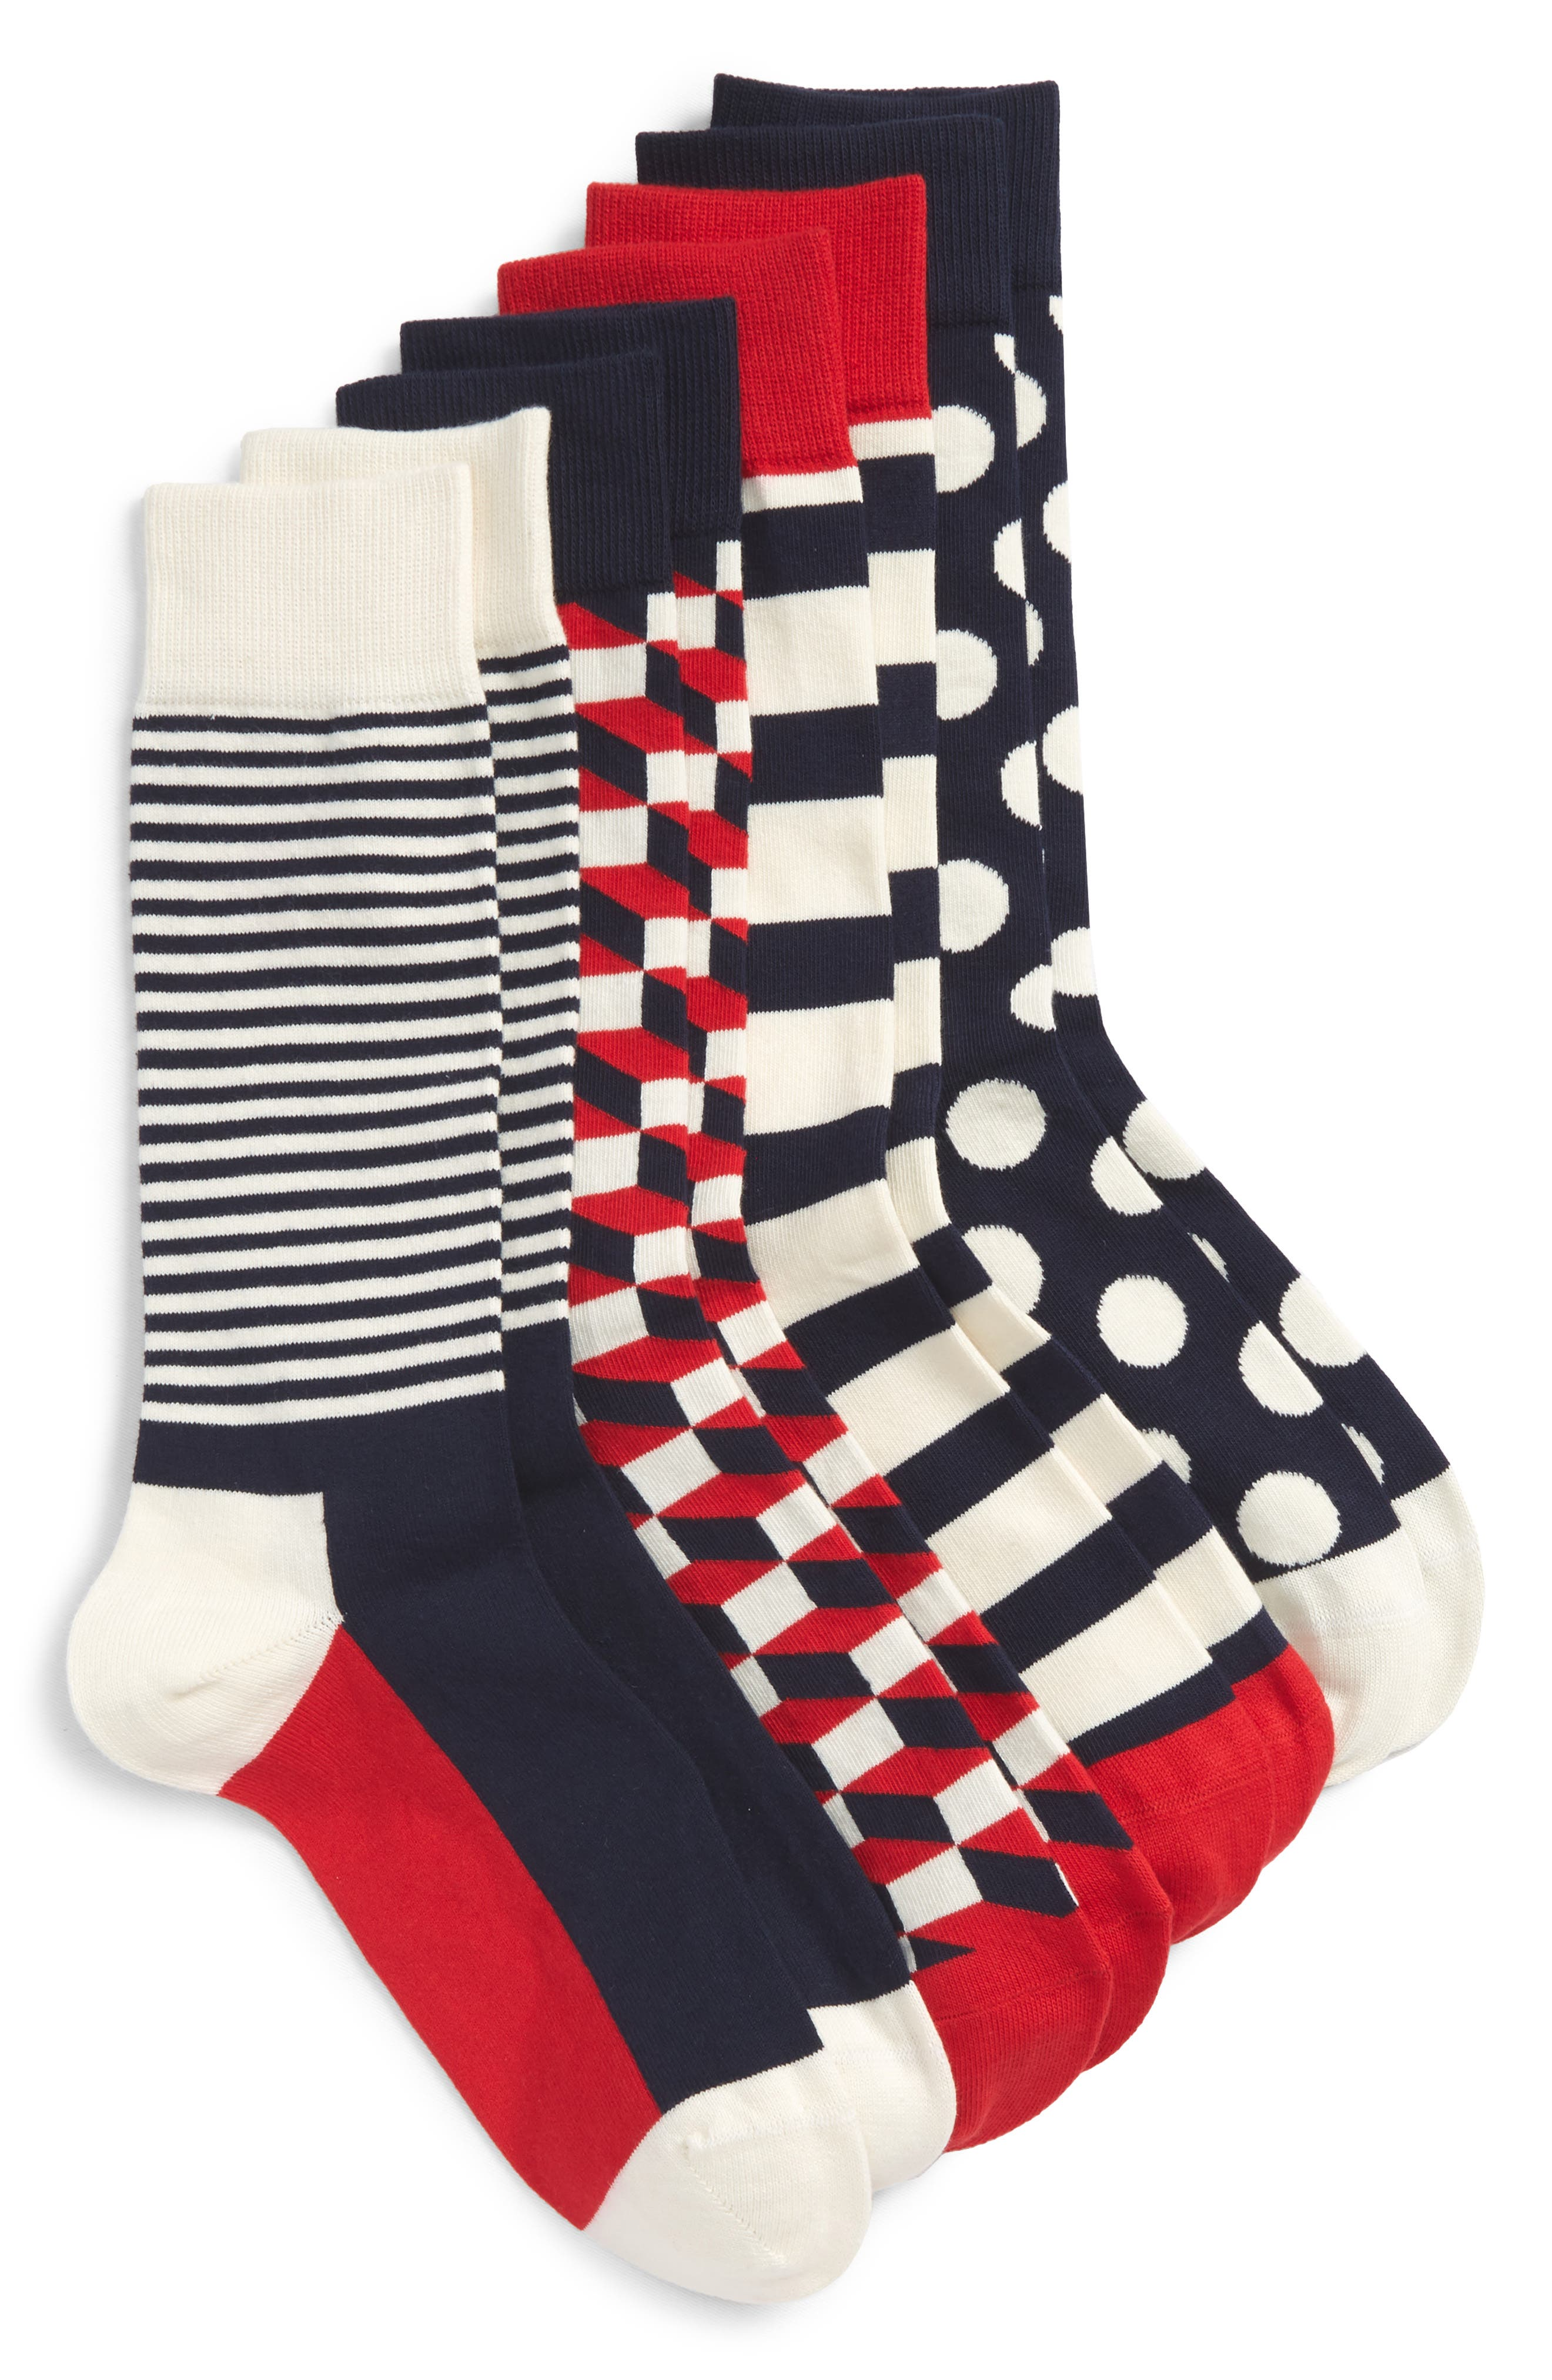 4-Pack Sock Gift Set,                             Main thumbnail 1, color,                             411